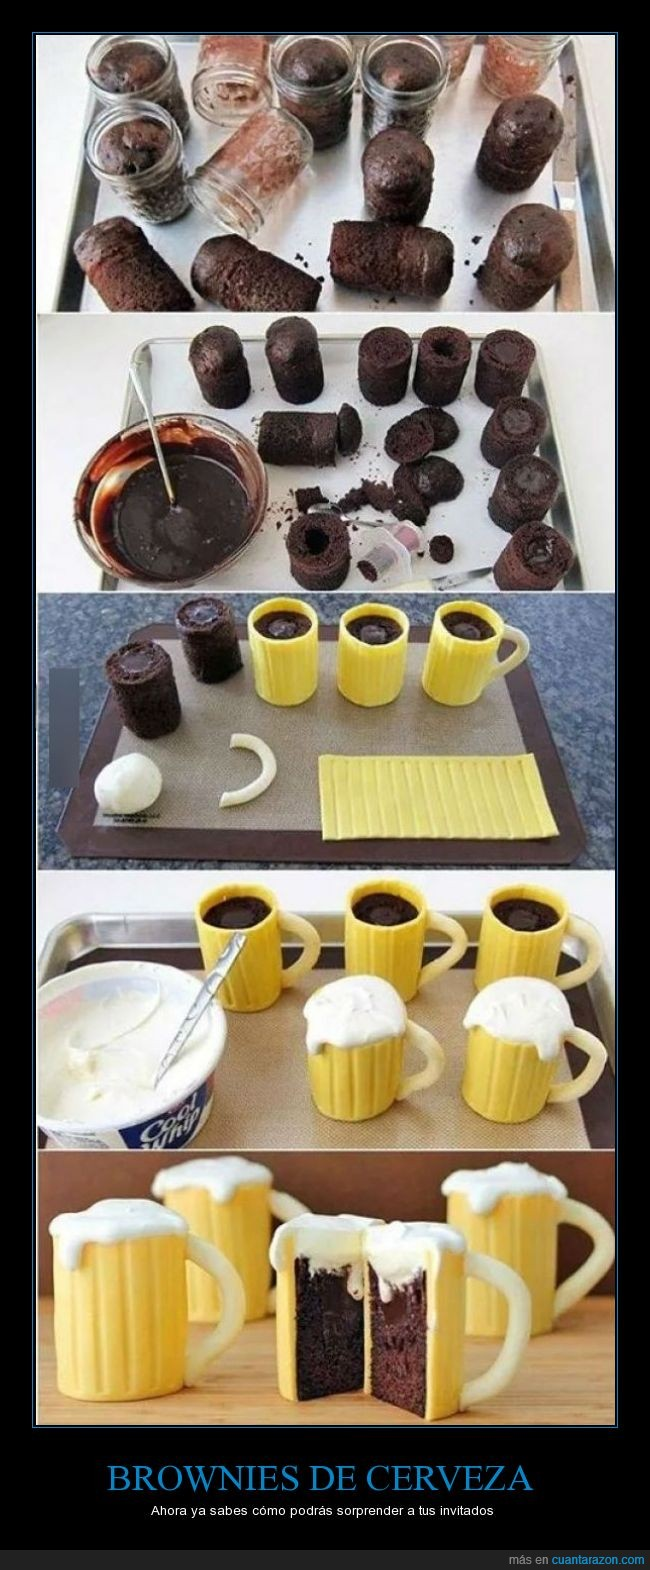 brownie,cerveza,crema,cupcake,dulce,invitados,jarra,pasabocas,pastel de cerveza